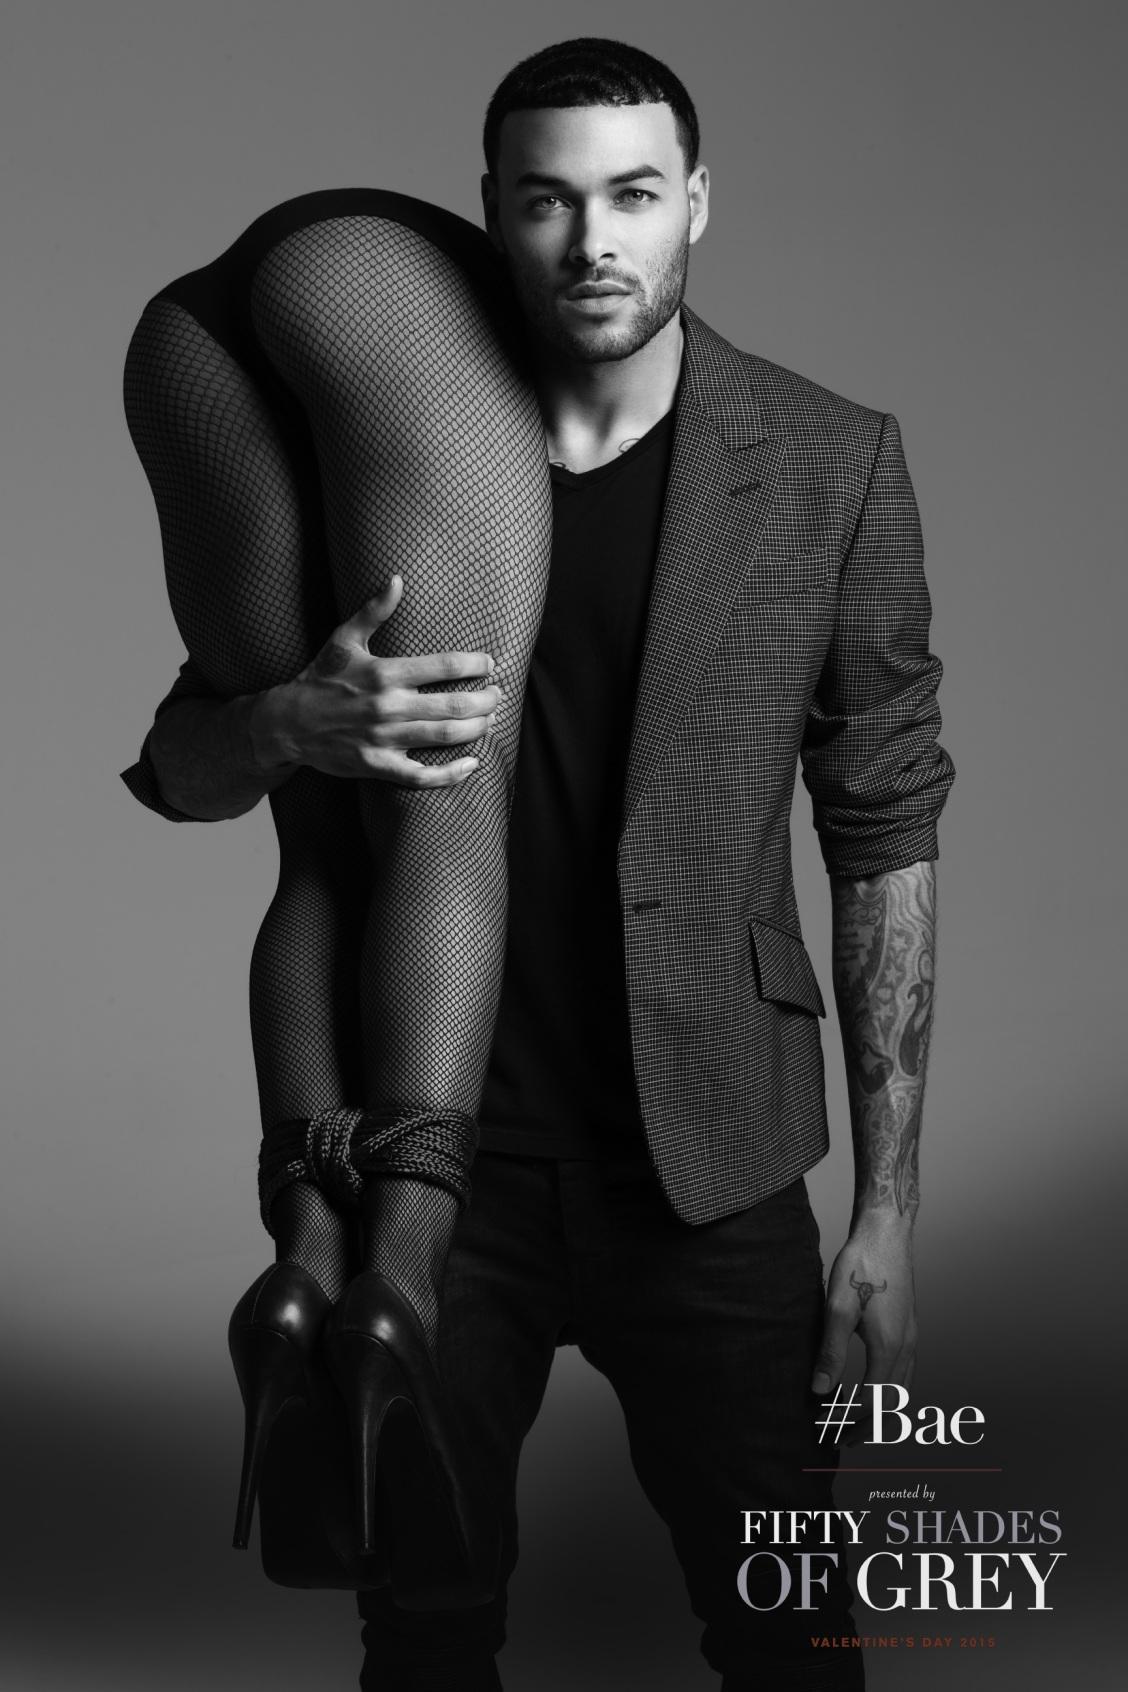 Don Benjamin (Artist, America's Next Top Model - Cycle 20)